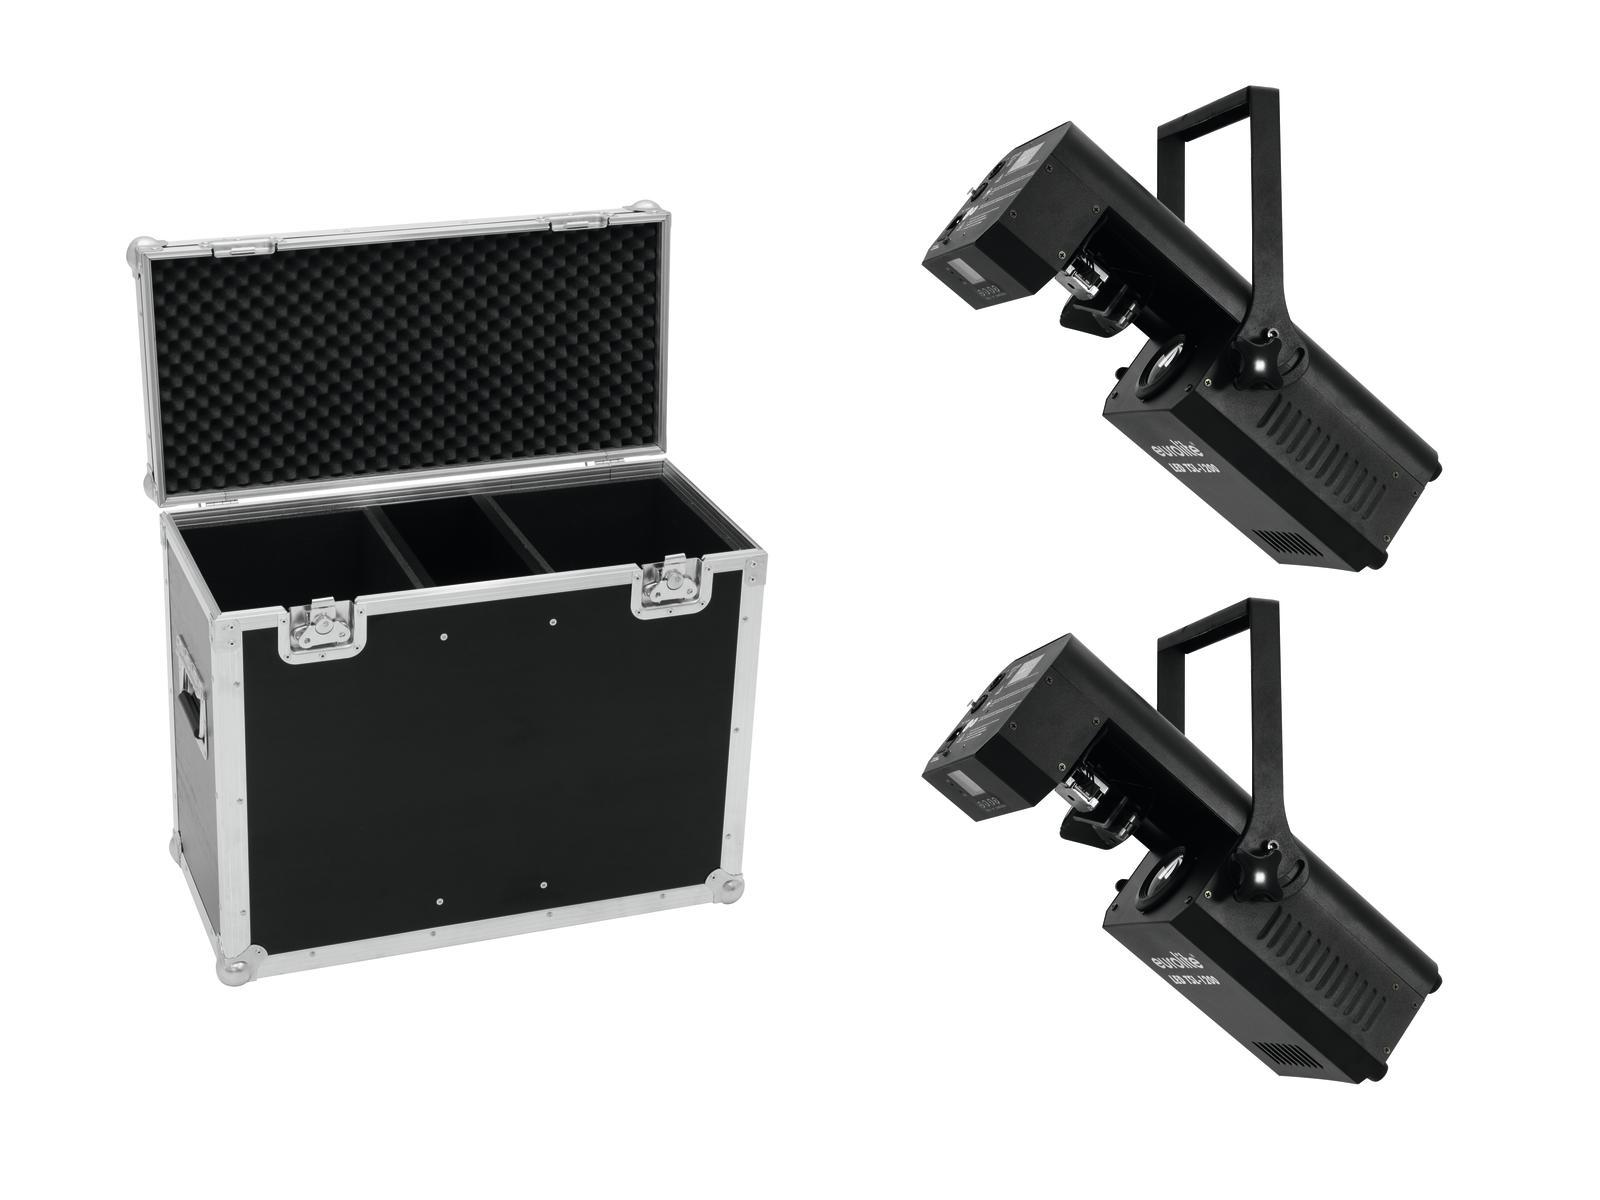 EUROLITE Set 2x LED TSL-1200 Scansione + Caso